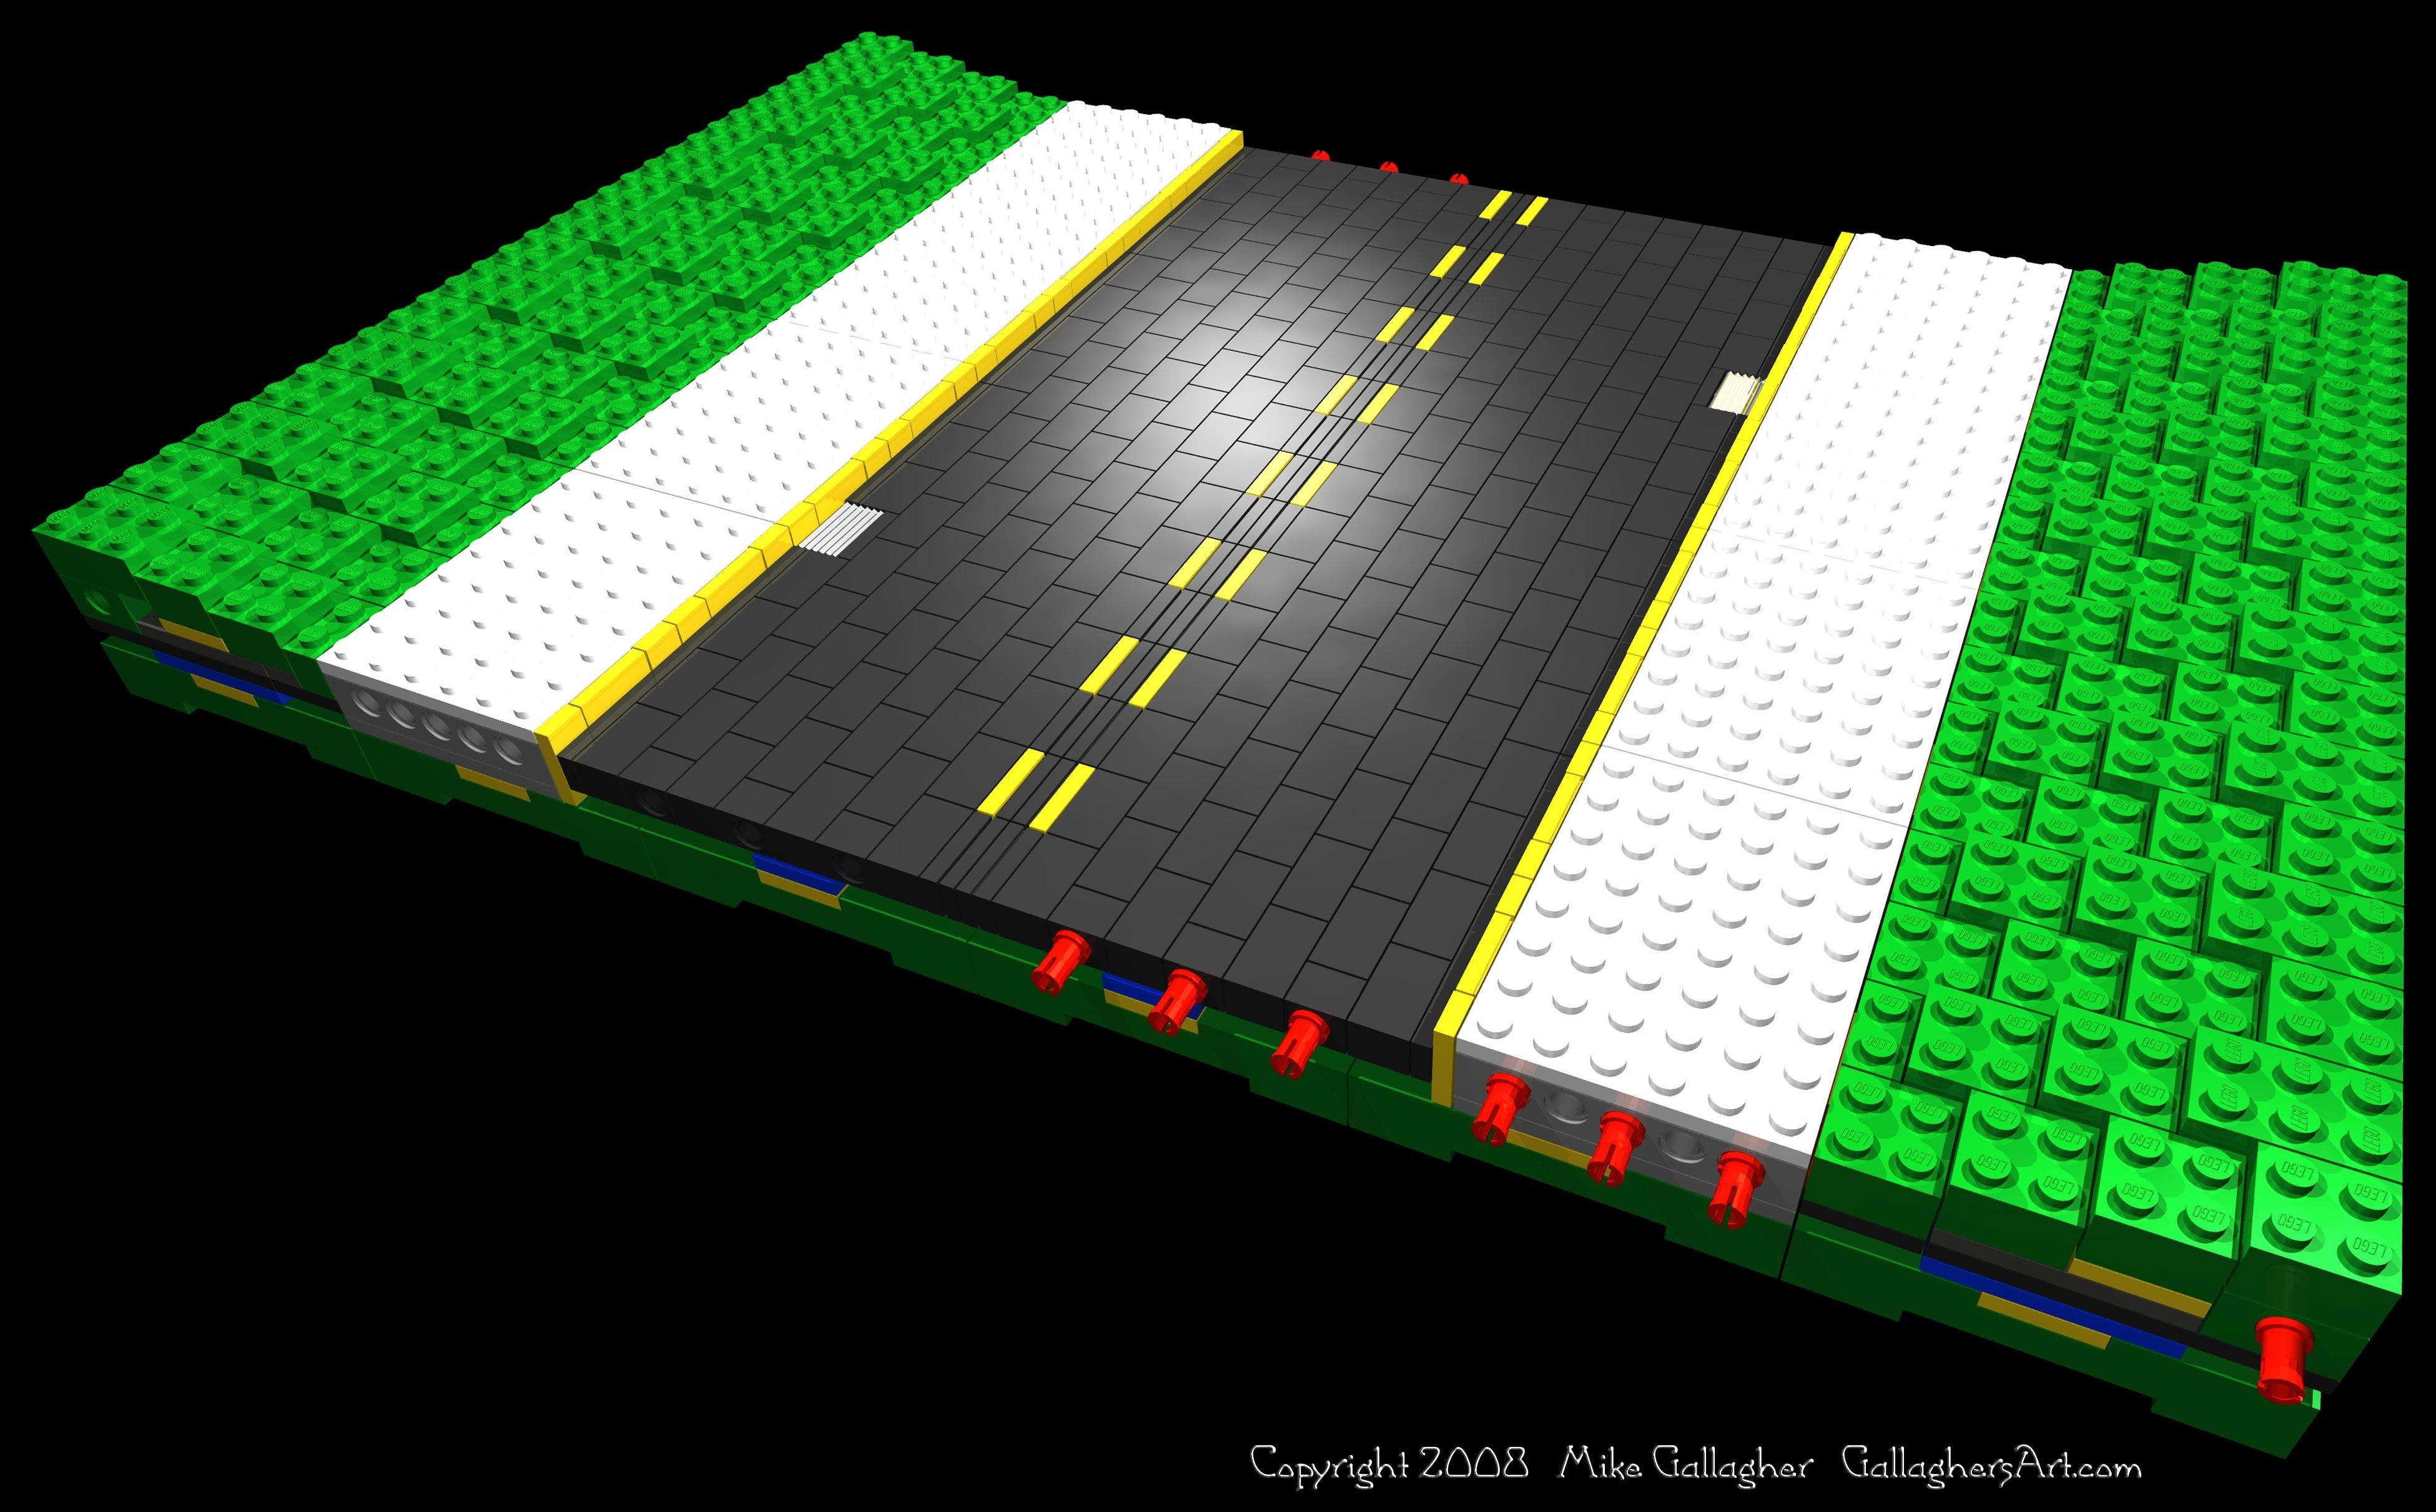 SP01D_S_Mod.jpg from Custom SNOT Roads SP01